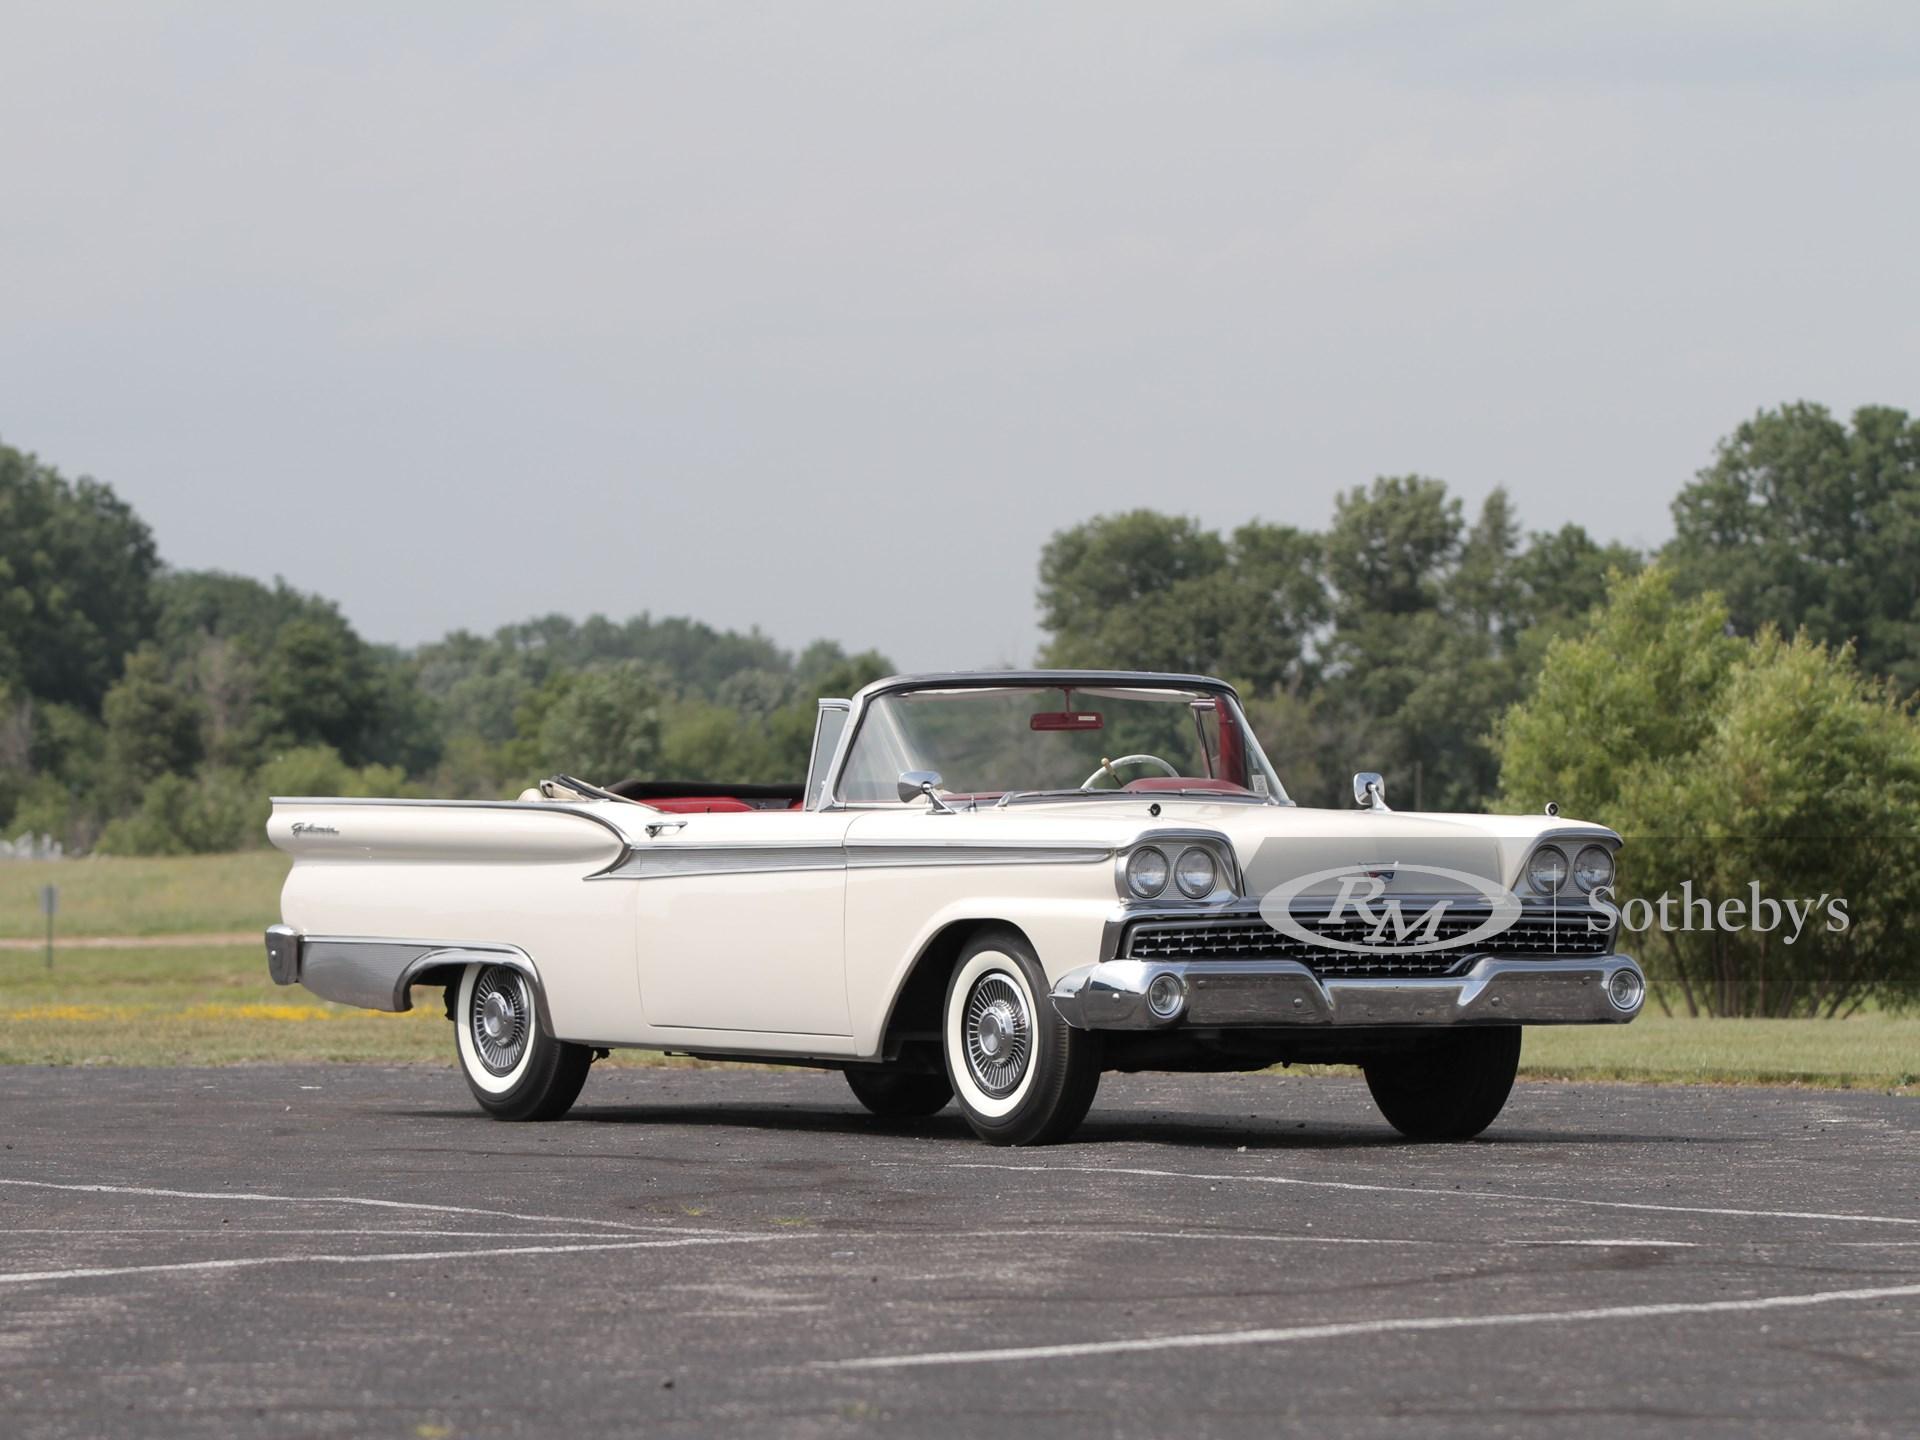 1959 Ford Fairlane 500 Galaxie Sunliner